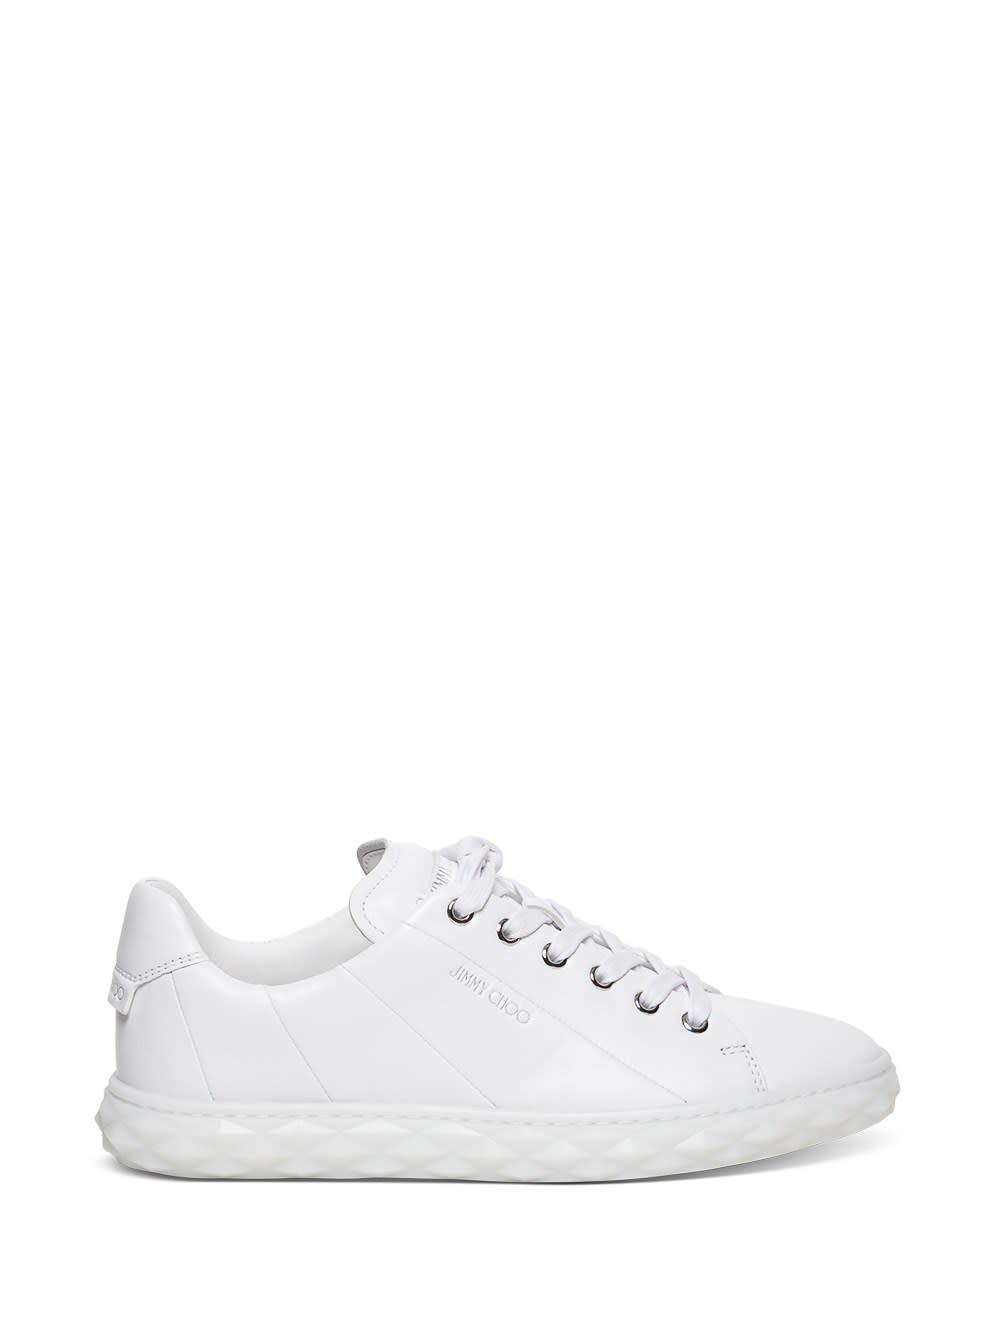 Jimmy Choo Sneakers DIAMOND LIGHT SNEAKERS IN WHITE LEATHER